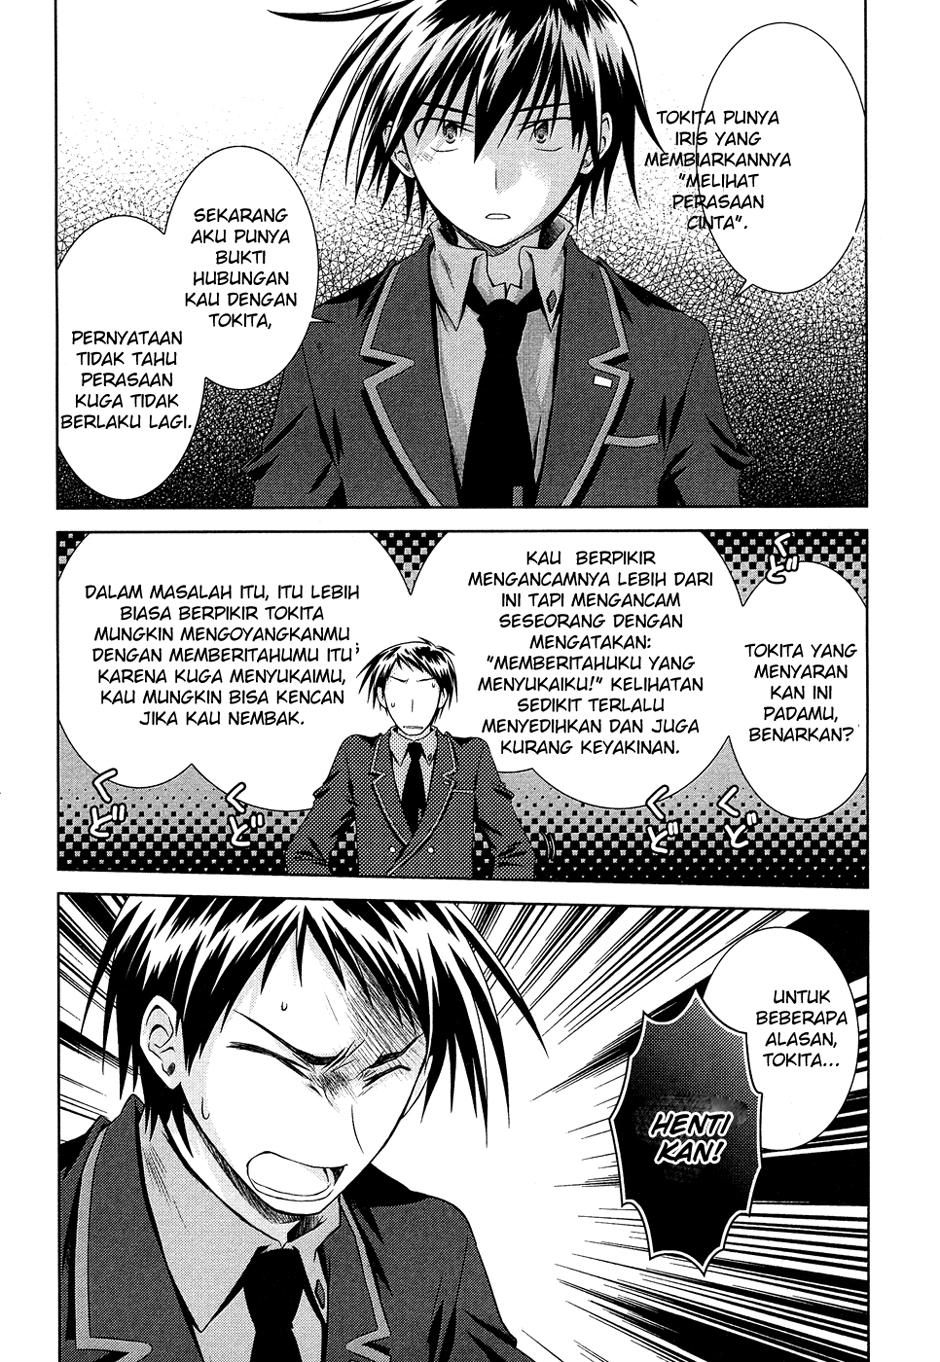 Komik iris zero 011 12 Indonesia iris zero 011 Terbaru 27 Baca Manga Komik Indonesia 